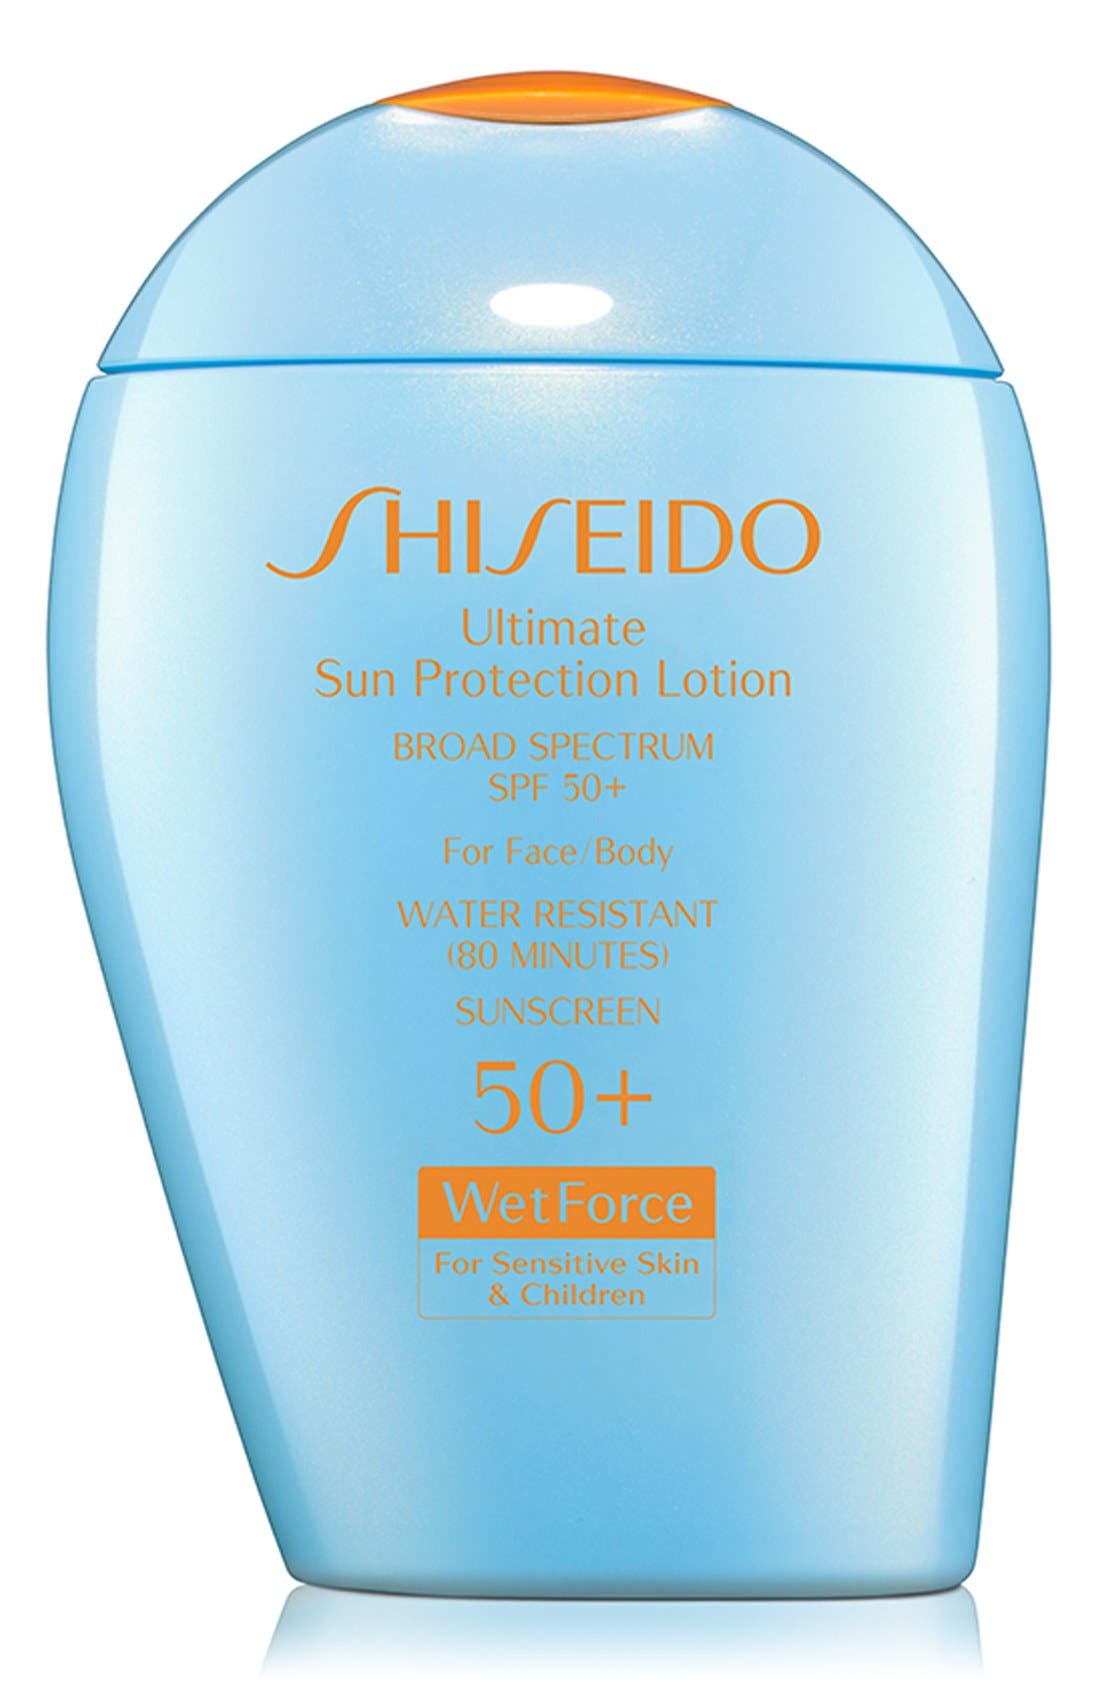 Shiseido Ultimate Sun Protection Lotion for Sensitive Skin & Children Broad Spectrum SPF 50+